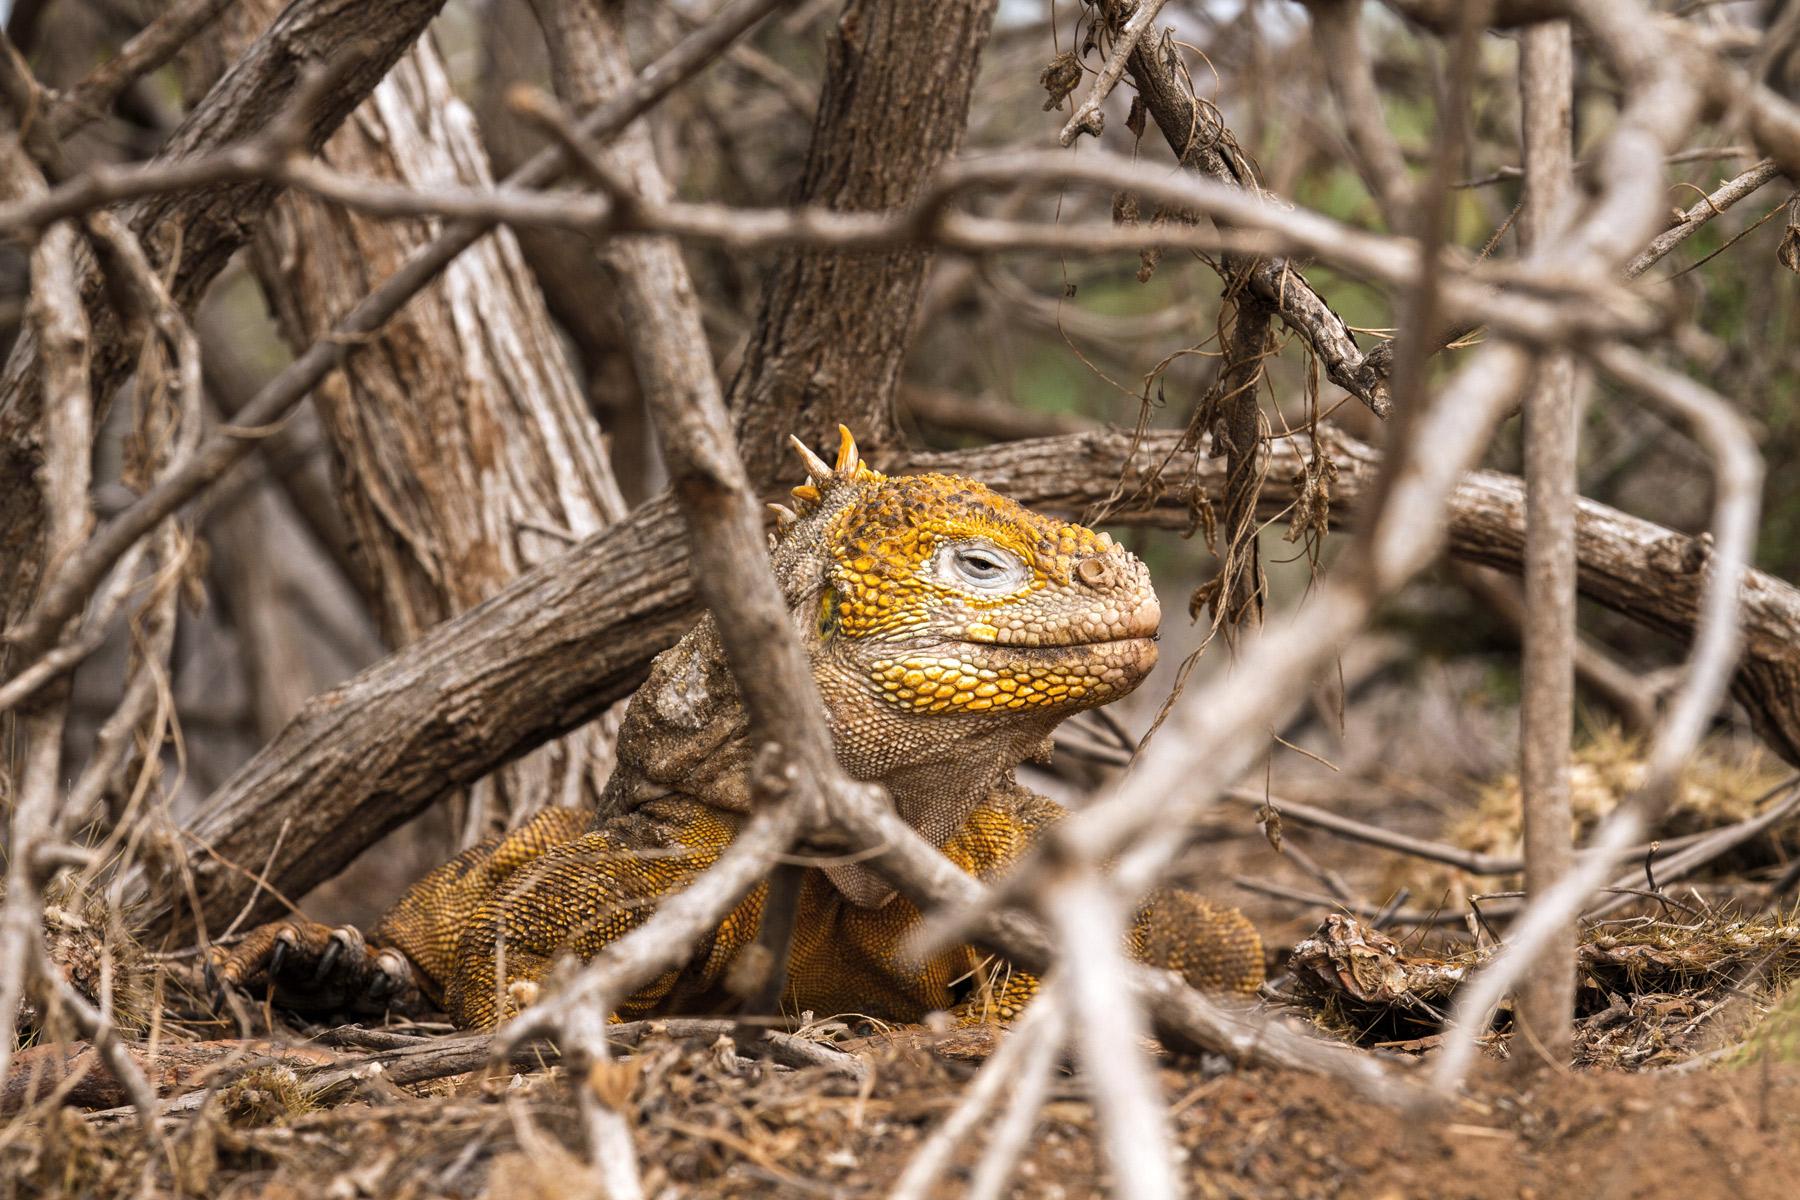 A land iguana at Cerro Dragon, Galapagos Islands